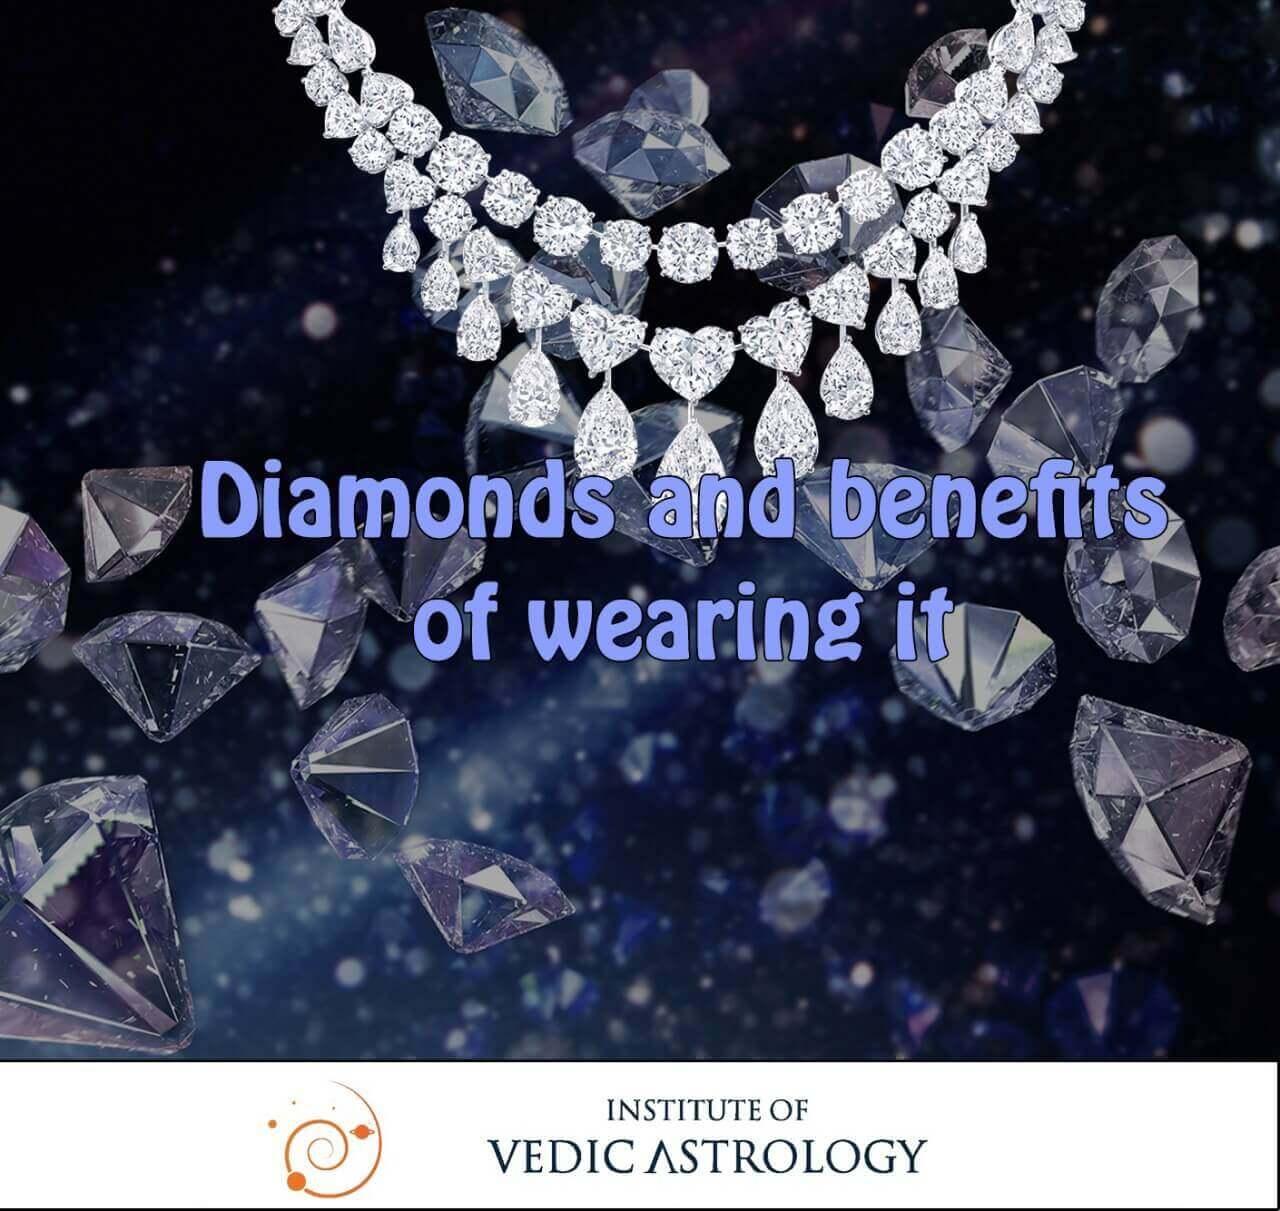 Diamonds, and benefits of wearing it